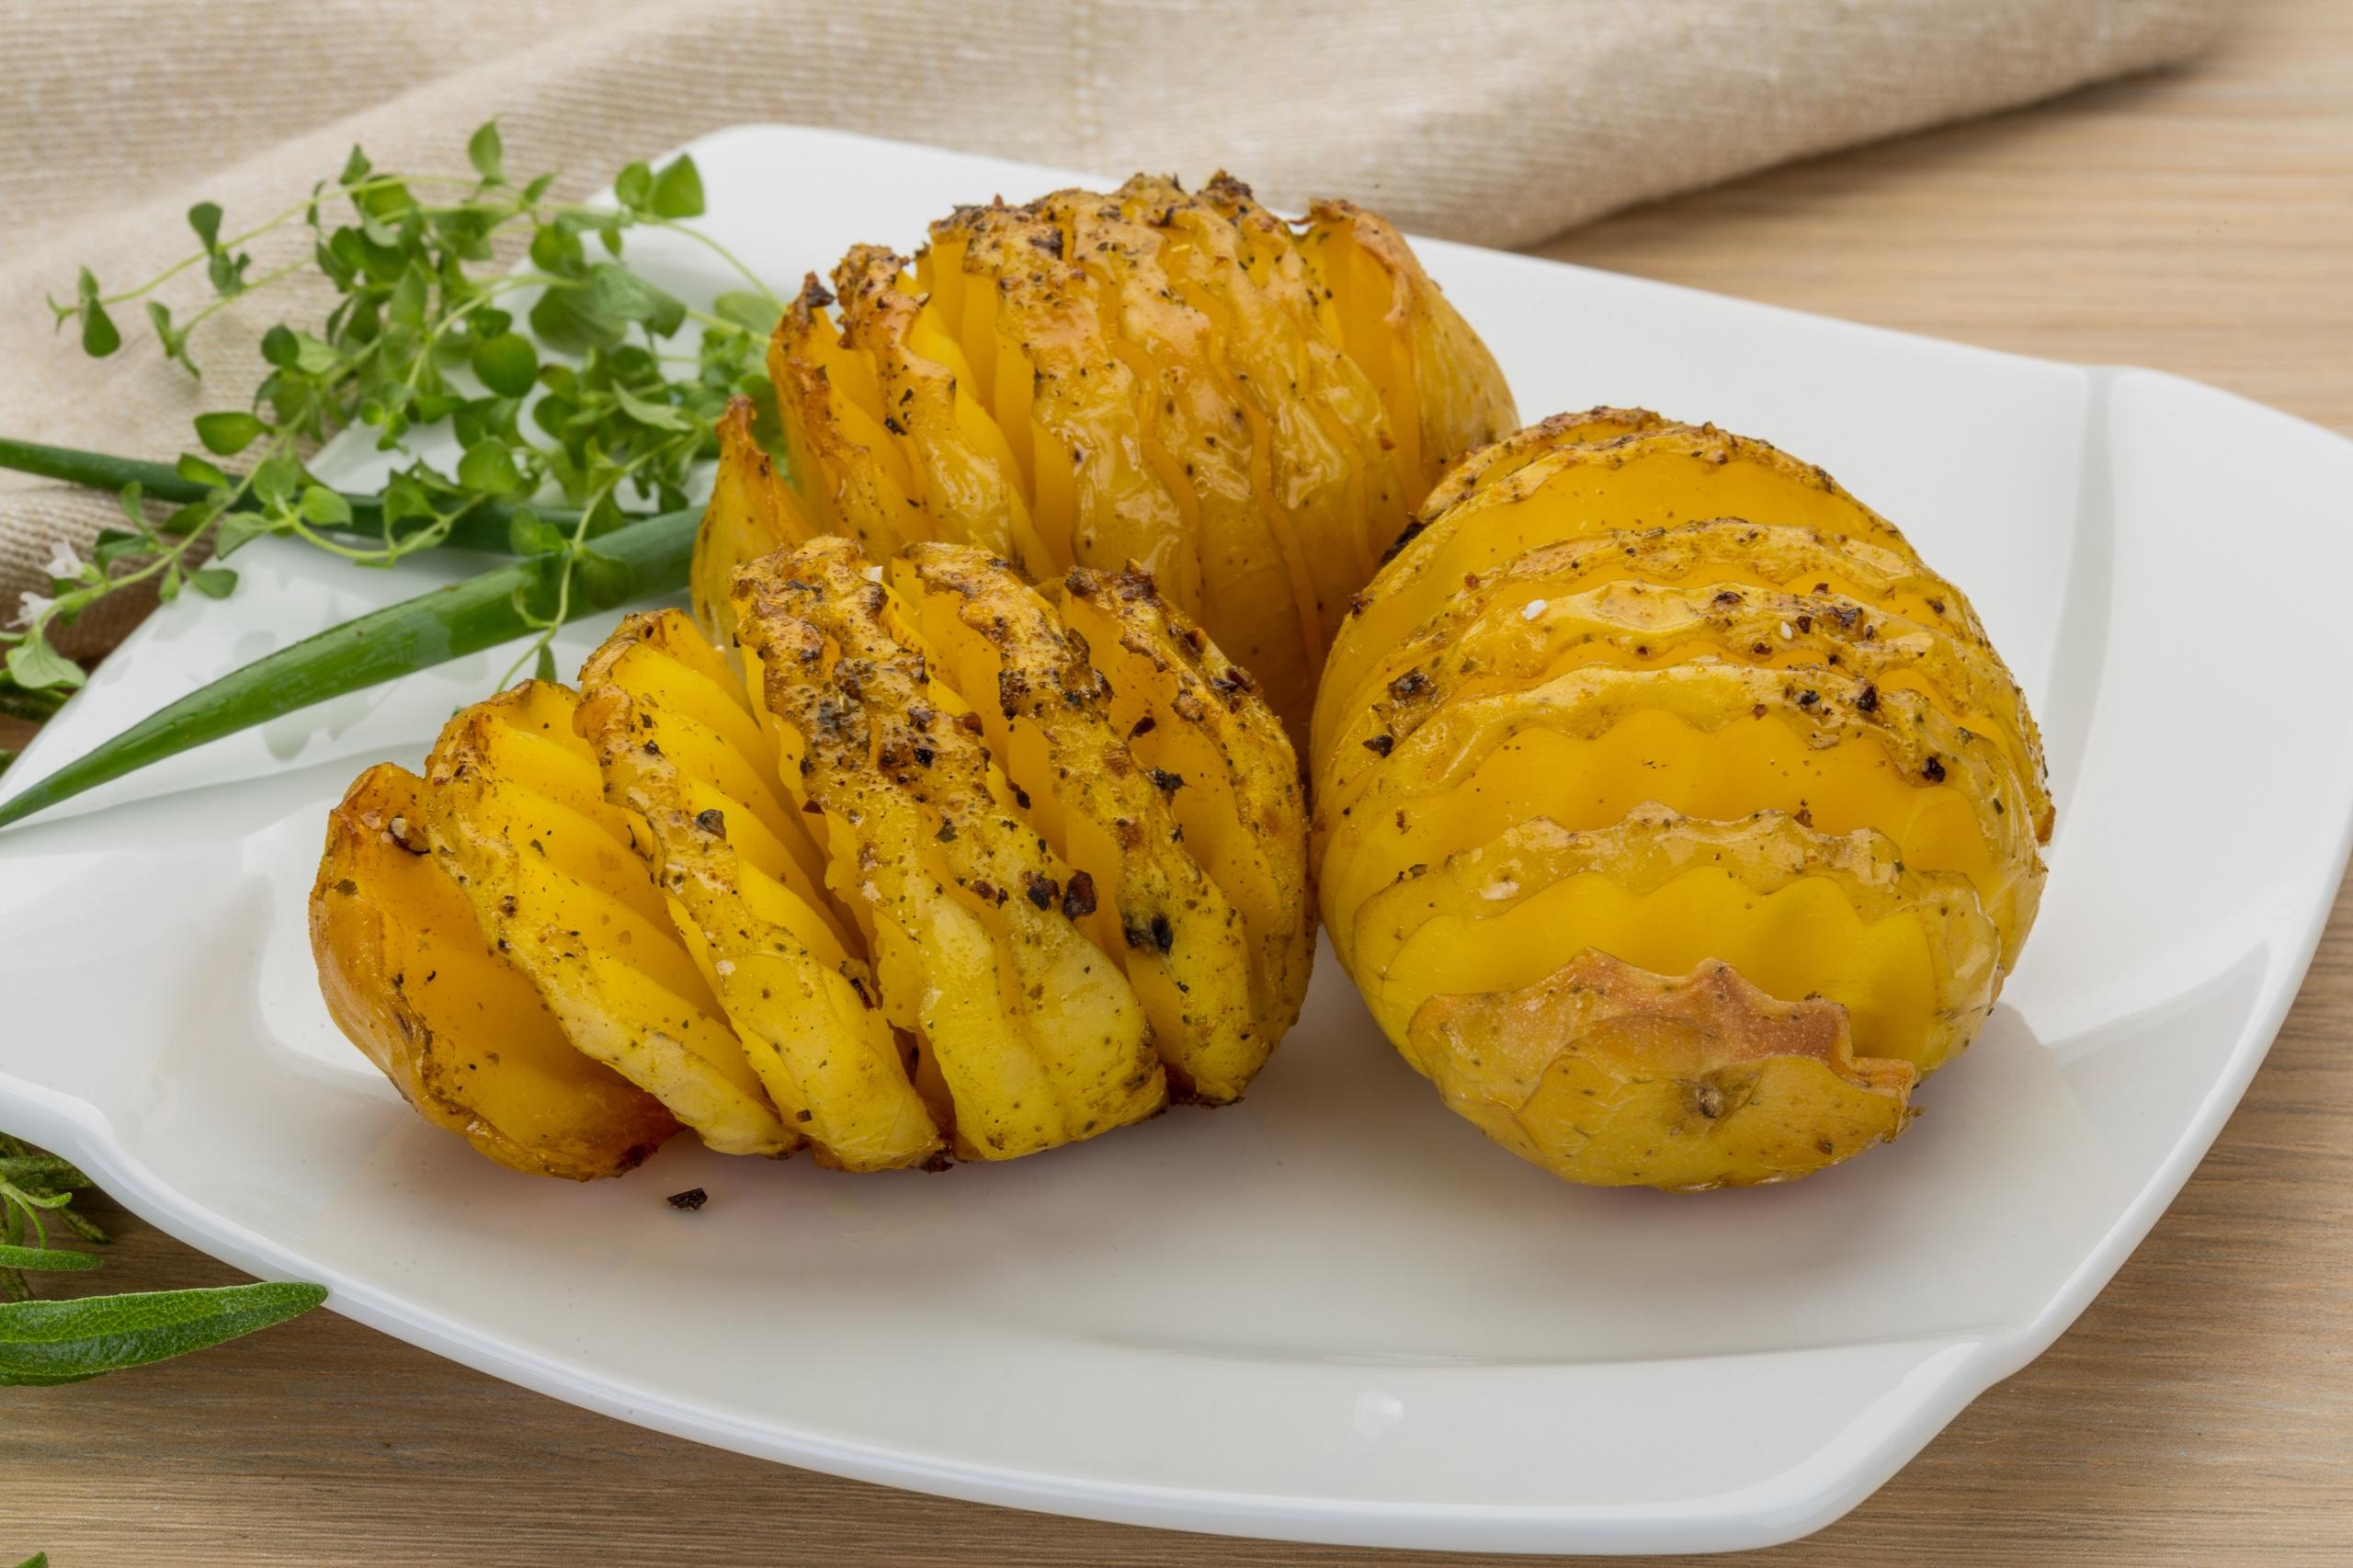 Фотография картошка Еда Тарелка 2560x1706 Картофель Пища тарелке Продукты питания